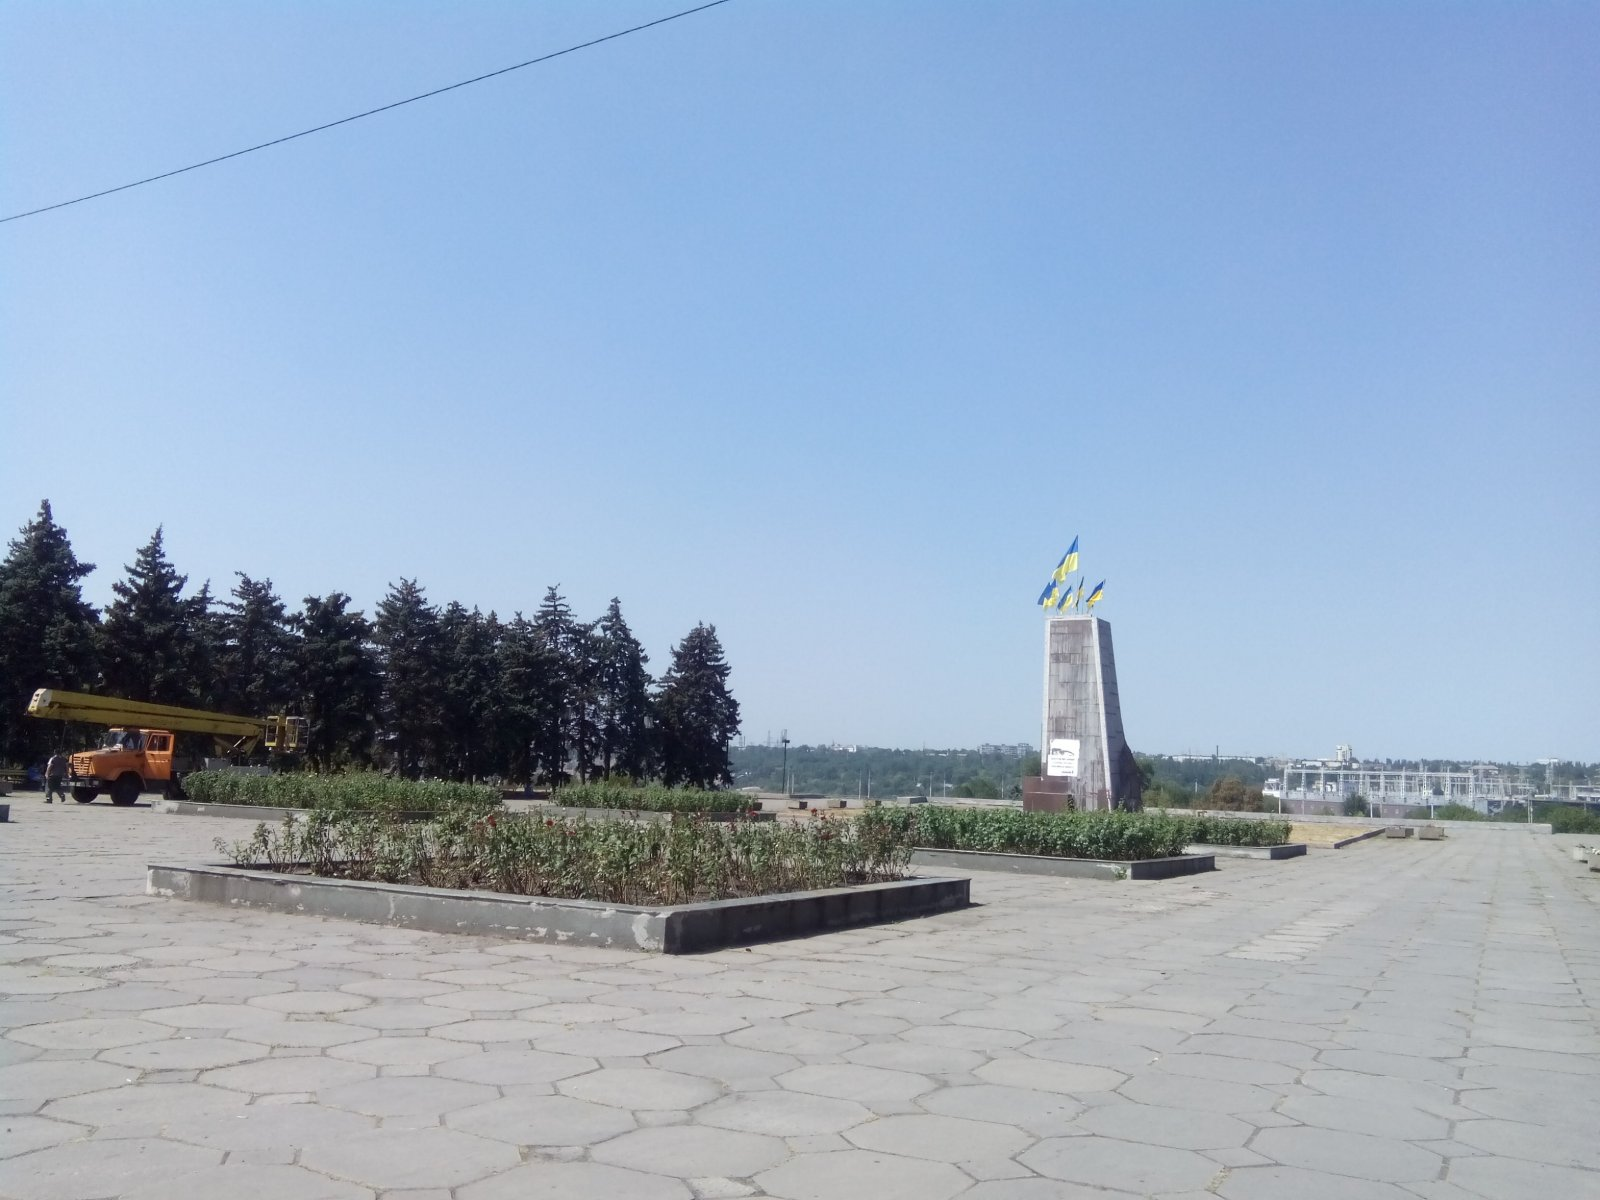 В Запорожье хотят вместо Ленина установить памятник строителям ДнепроГЭСа